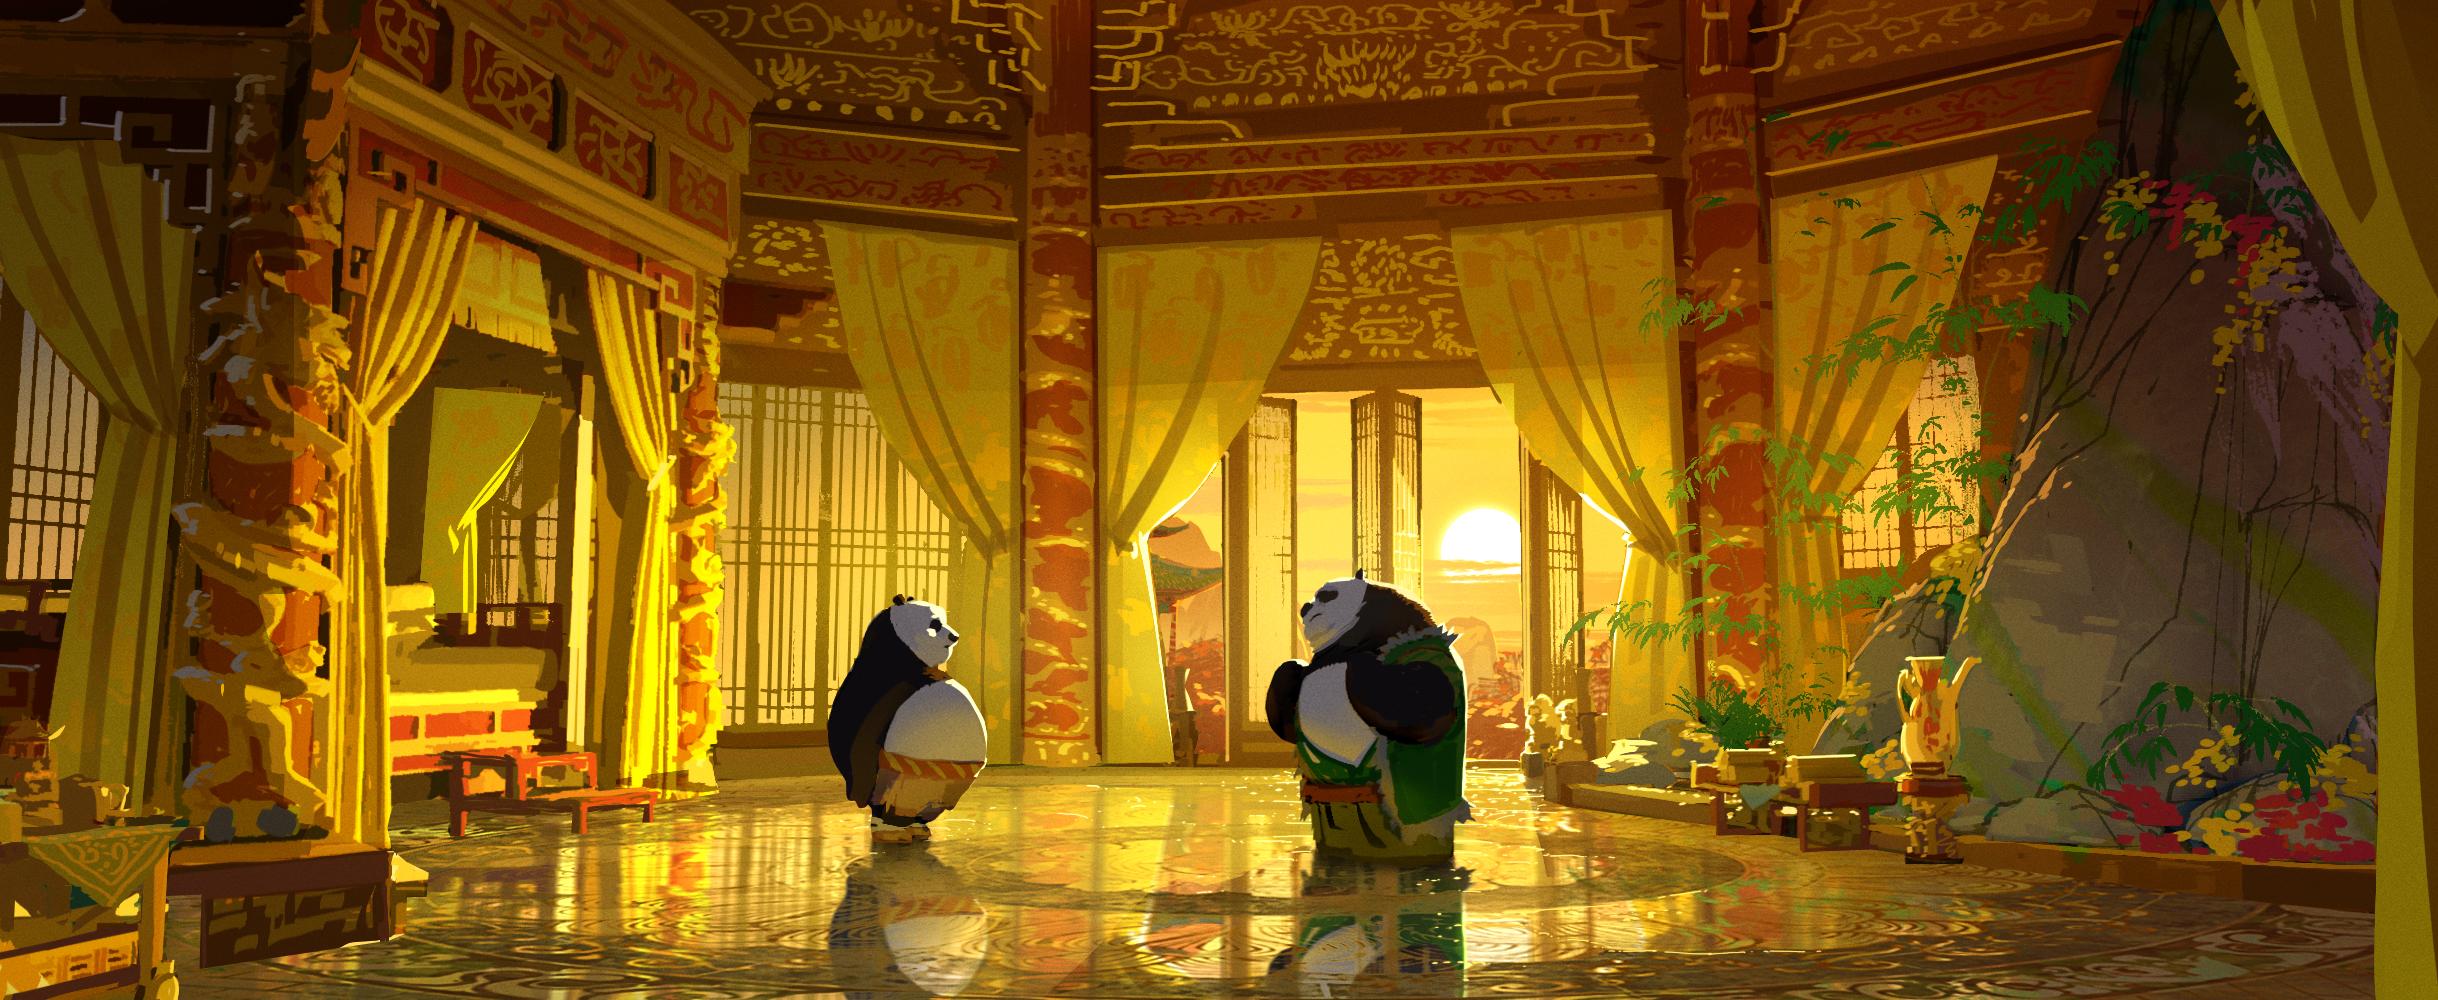 Kung Fu Panda 3, DWA Color key - Chrysanthemum suite